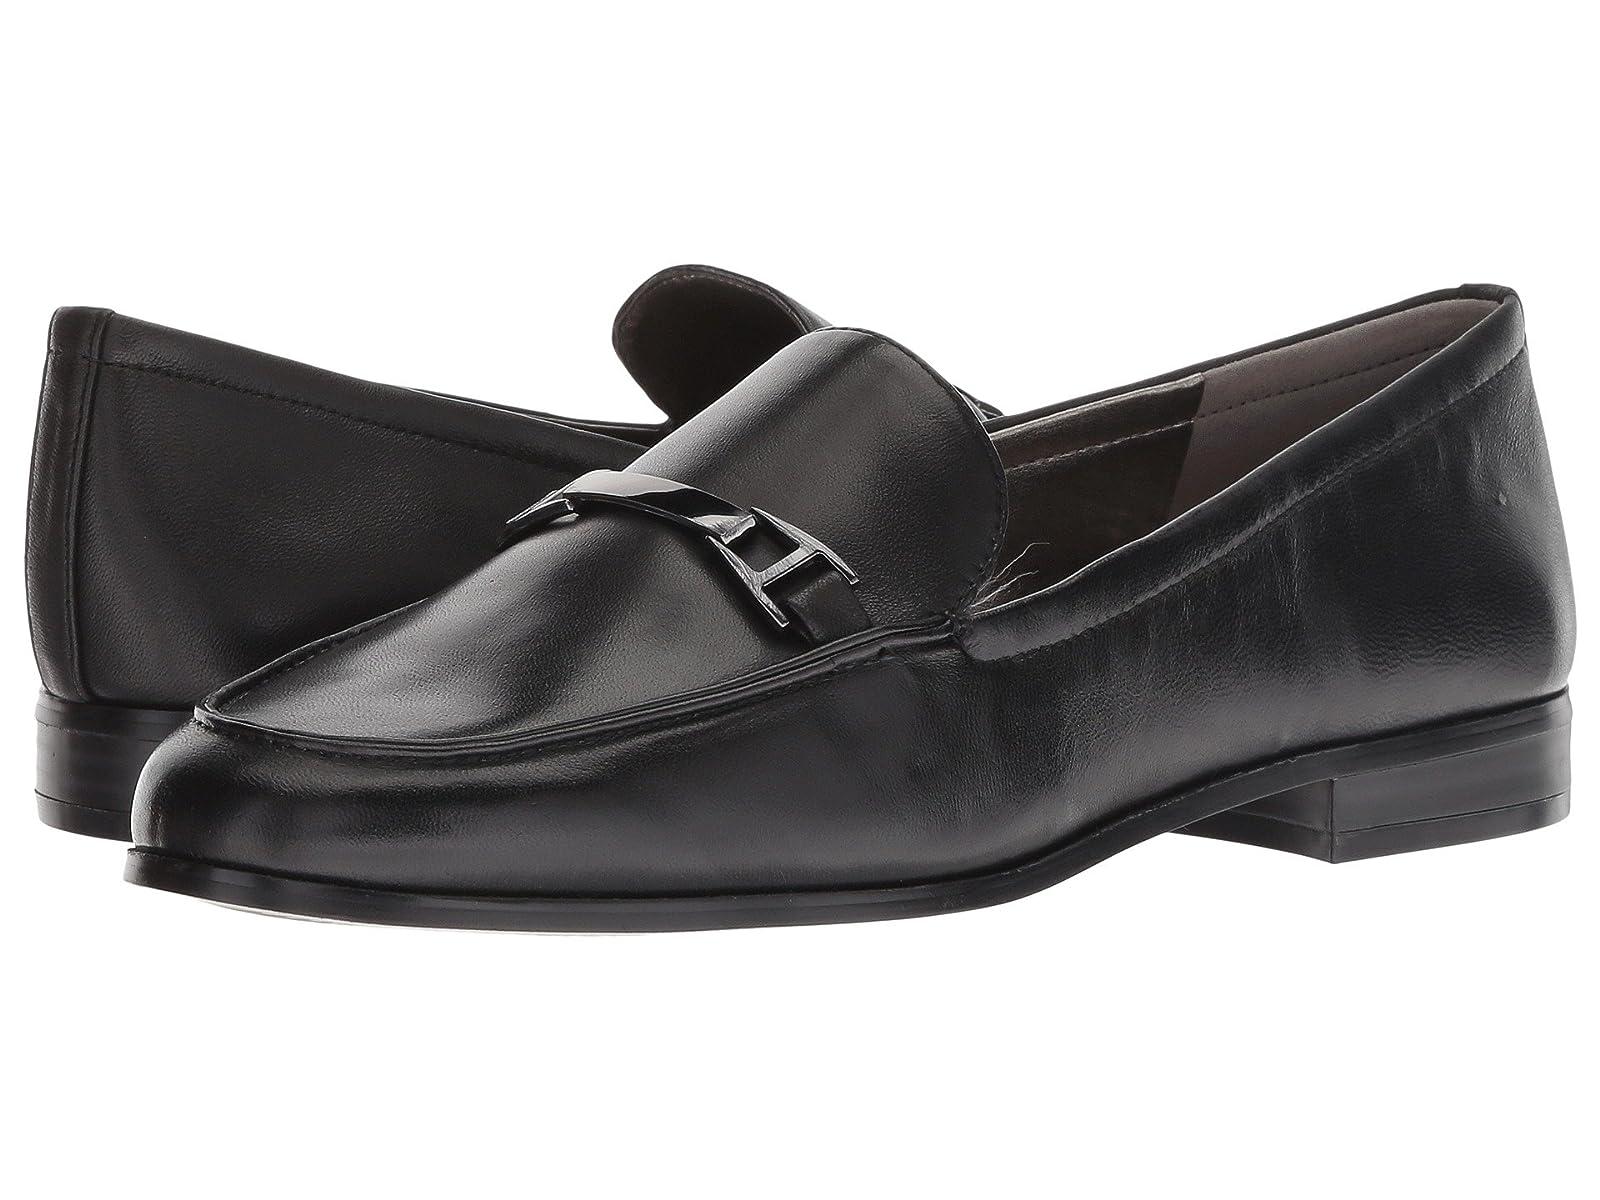 Bandolino LapentaAtmospheric grades have affordable shoes